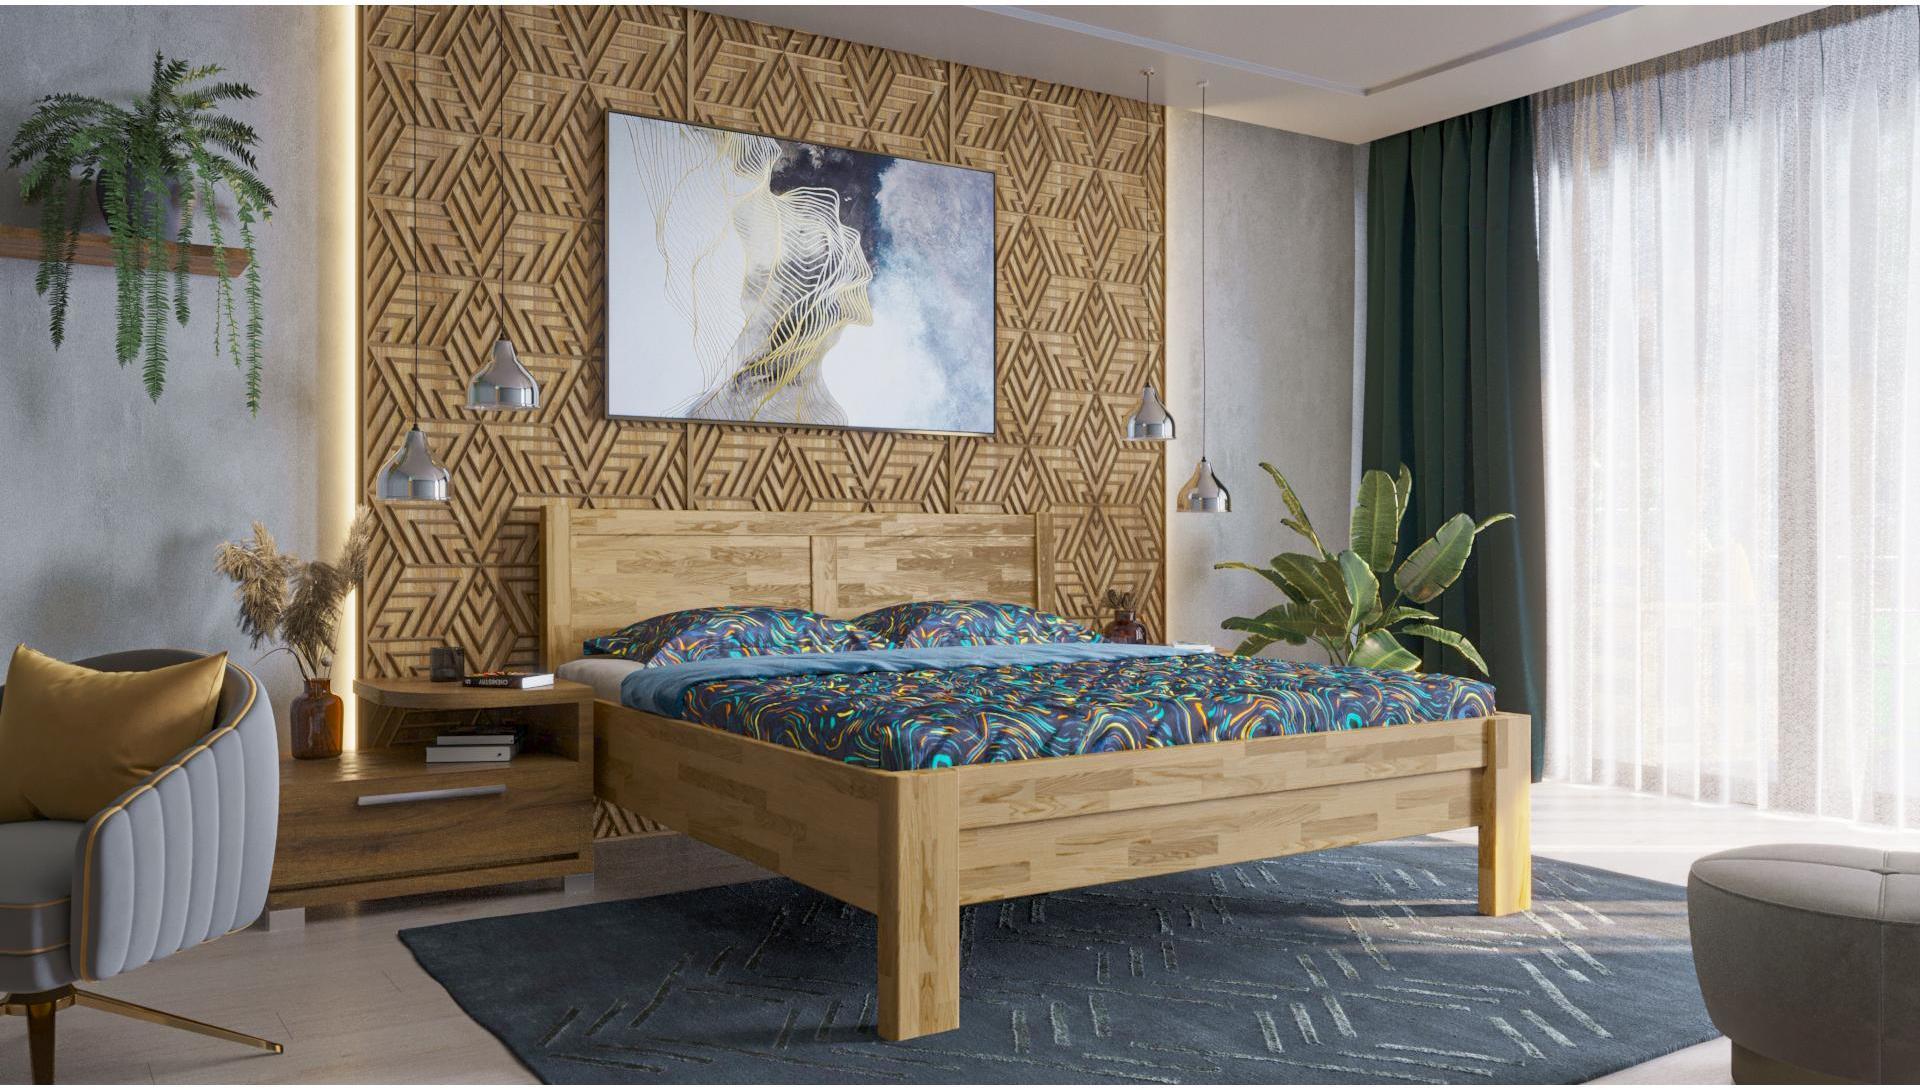 Celomasívna posteľ Celin H3 160x200 cm dub D1